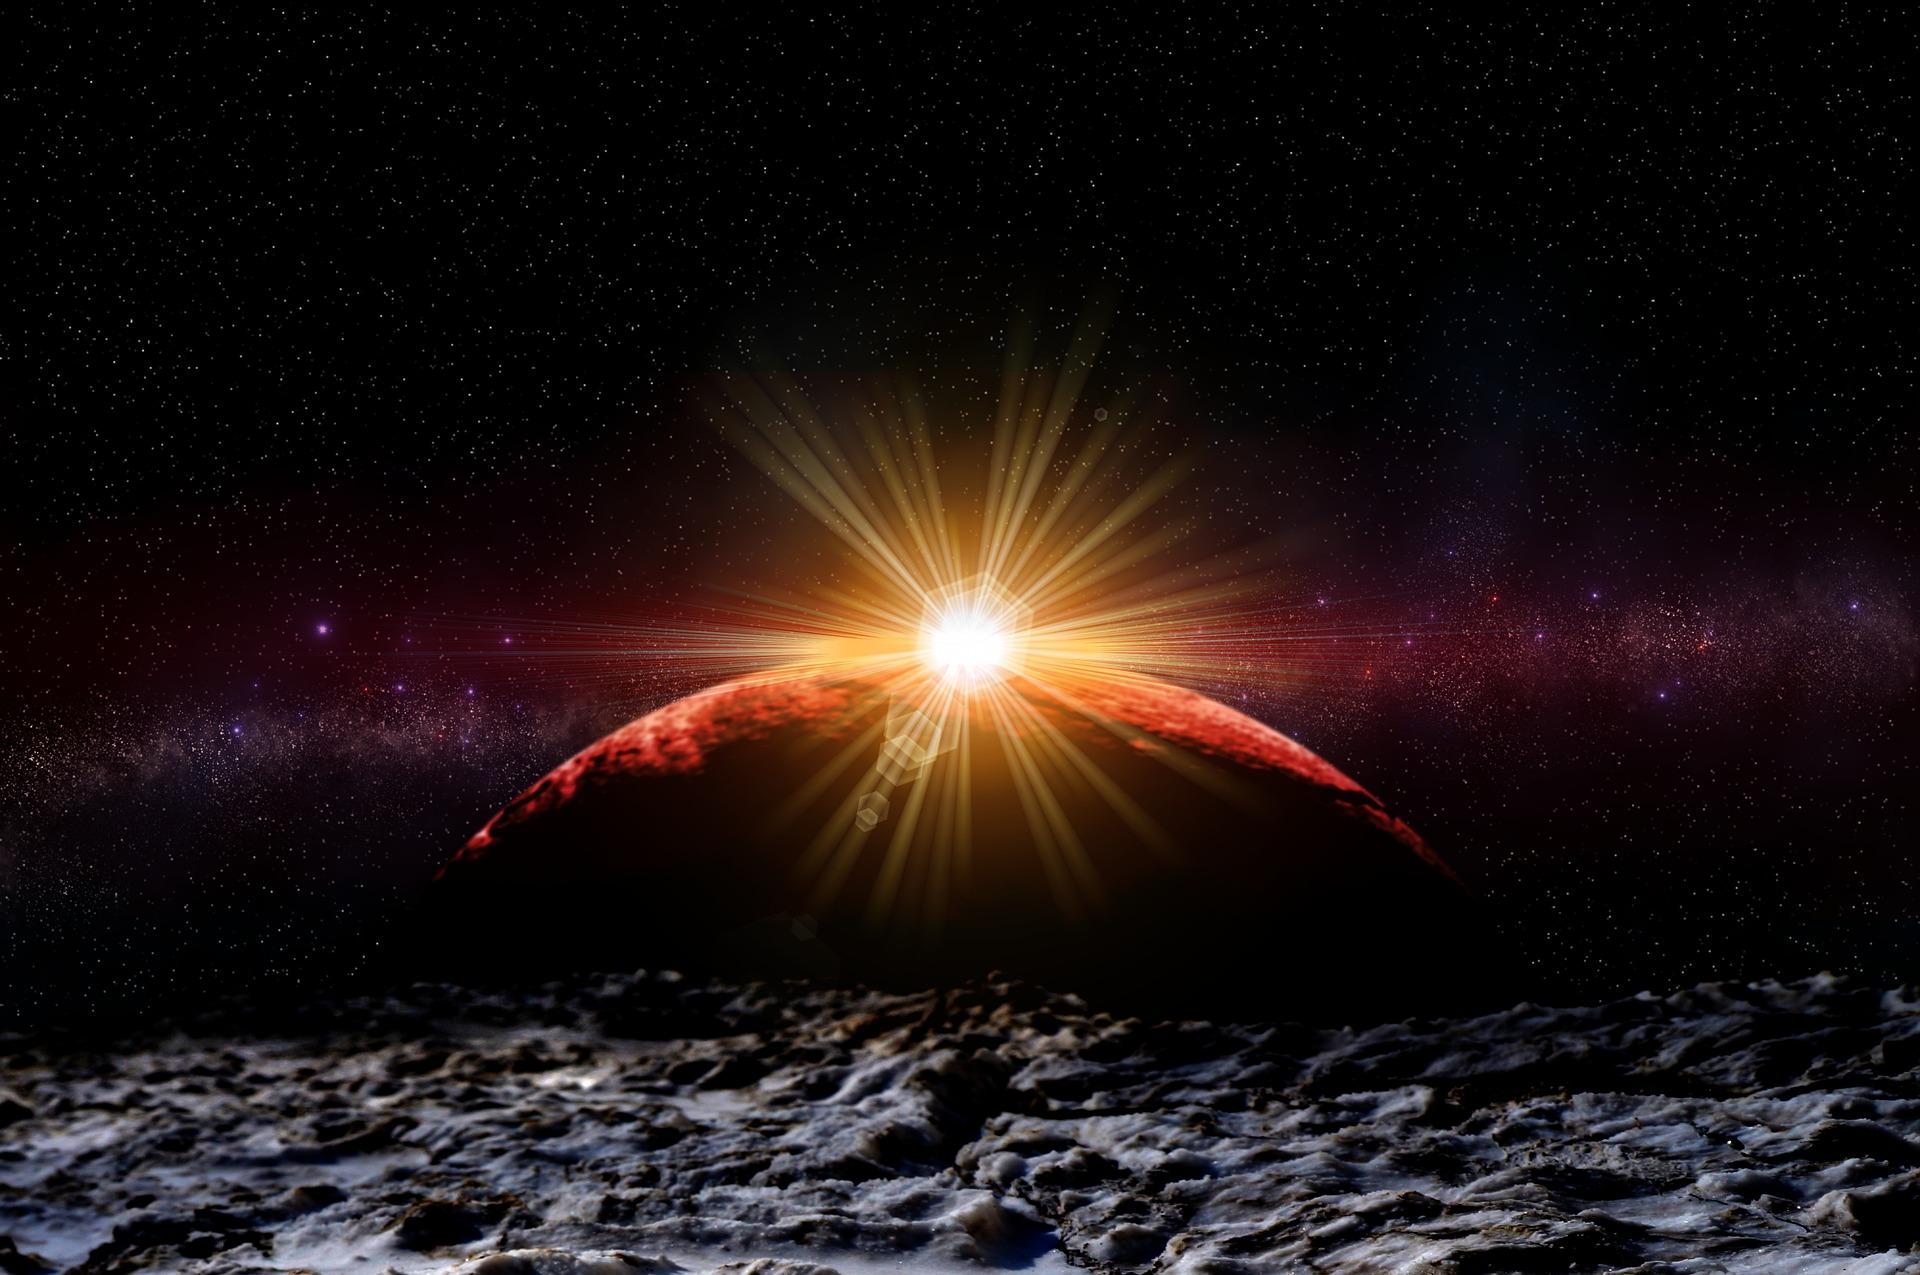 universe-1234380_1920.jpg